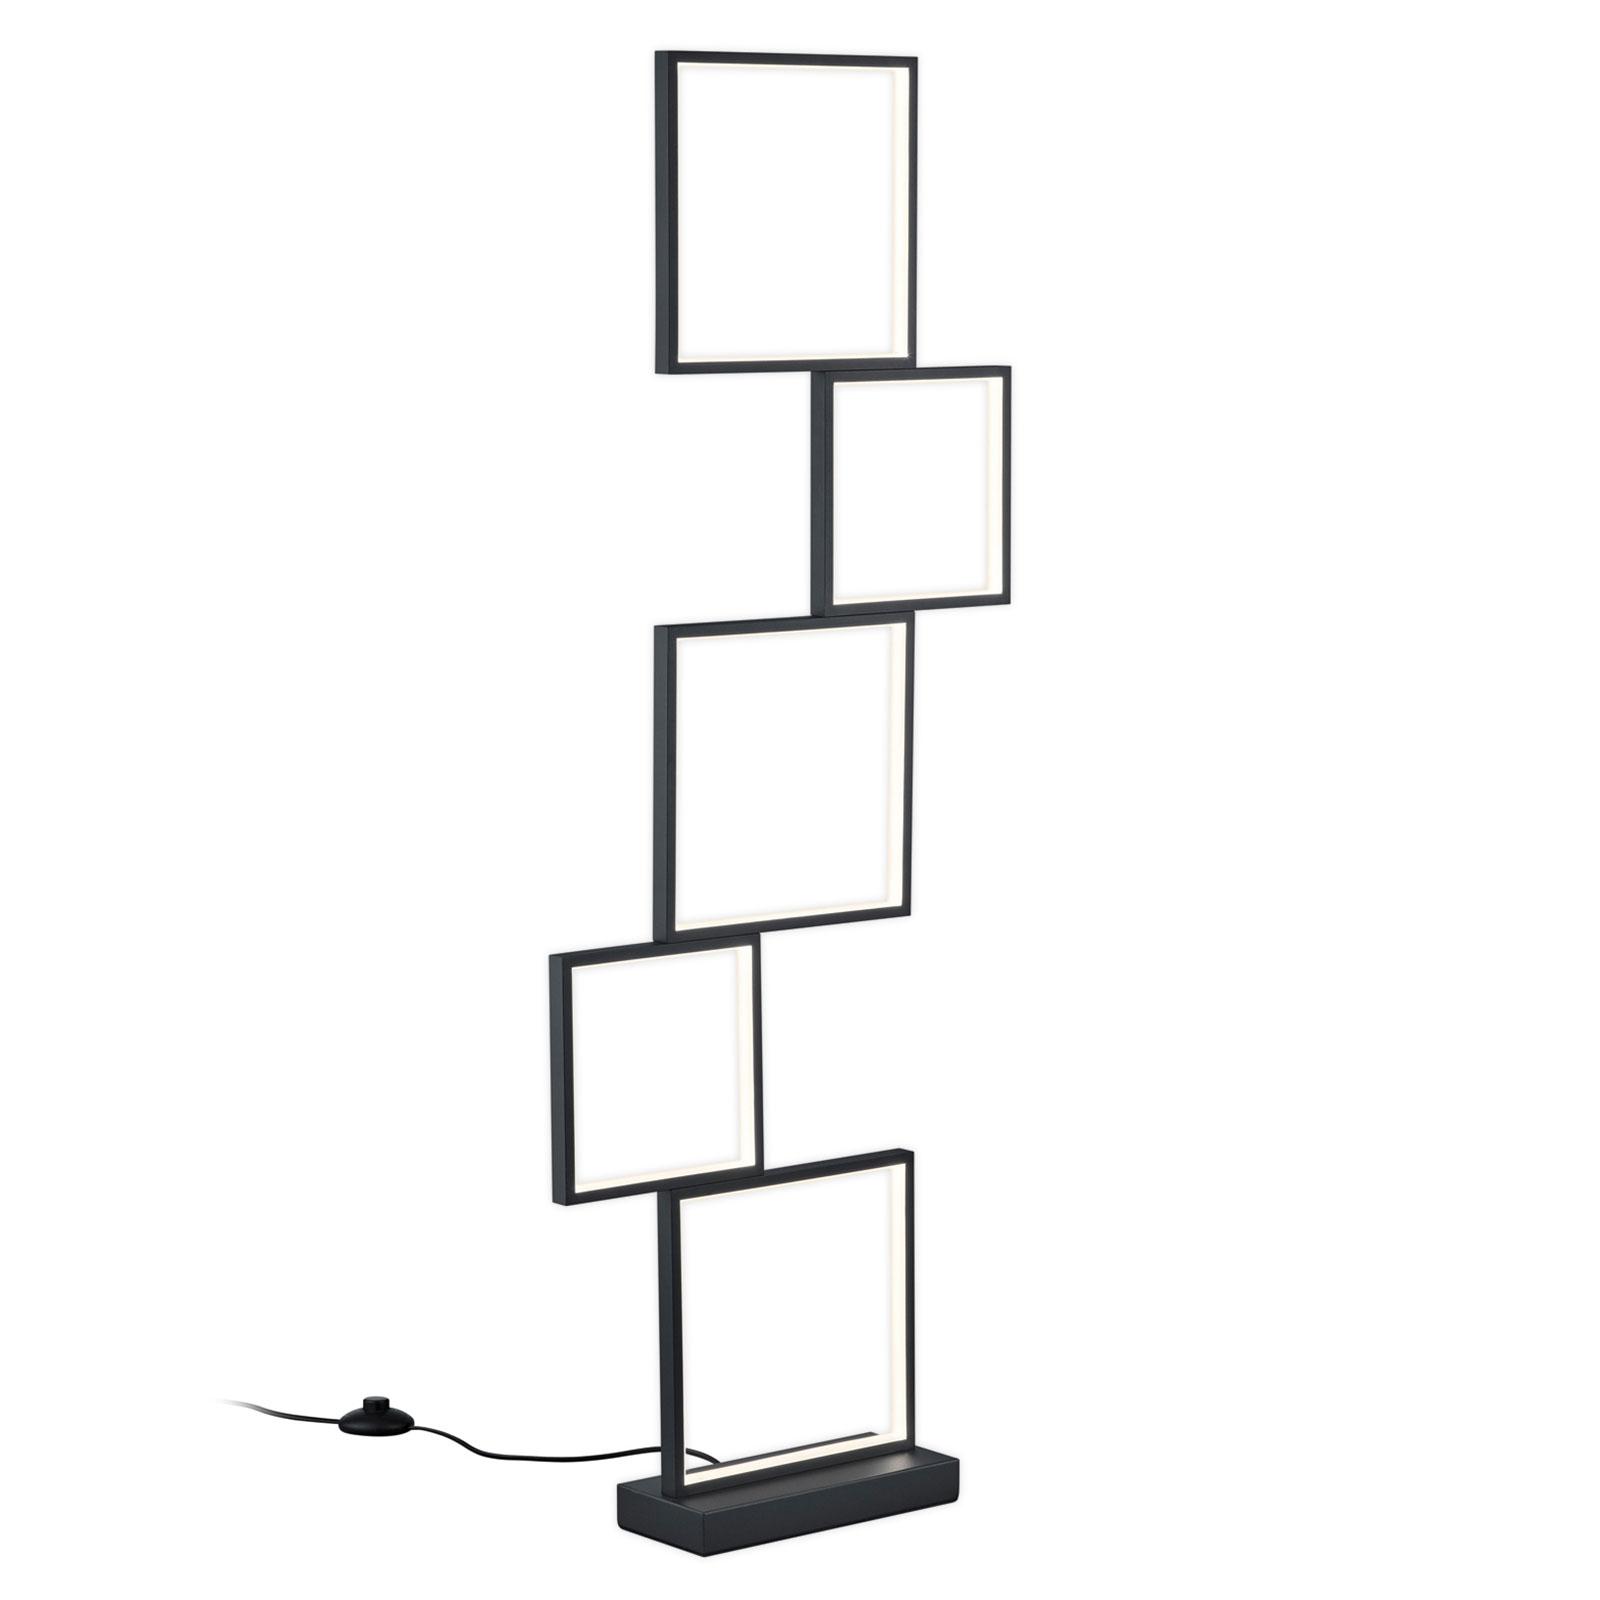 LED-Stehleuchte Sorrento, schwarz matt